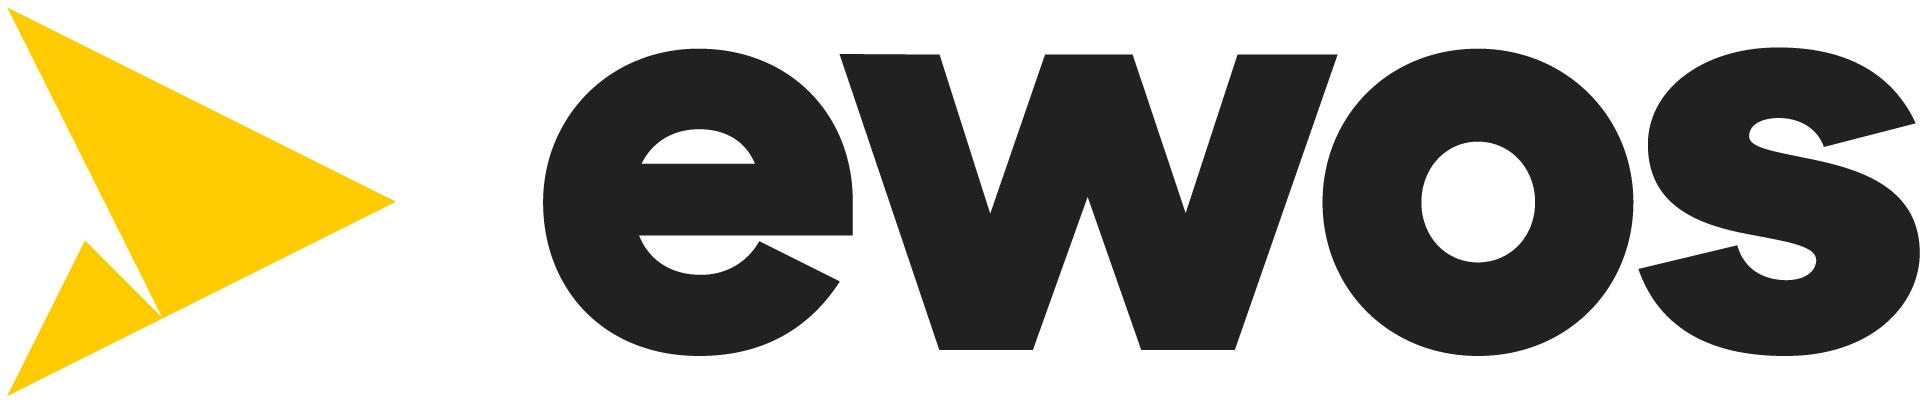 ewos swiss GmbH